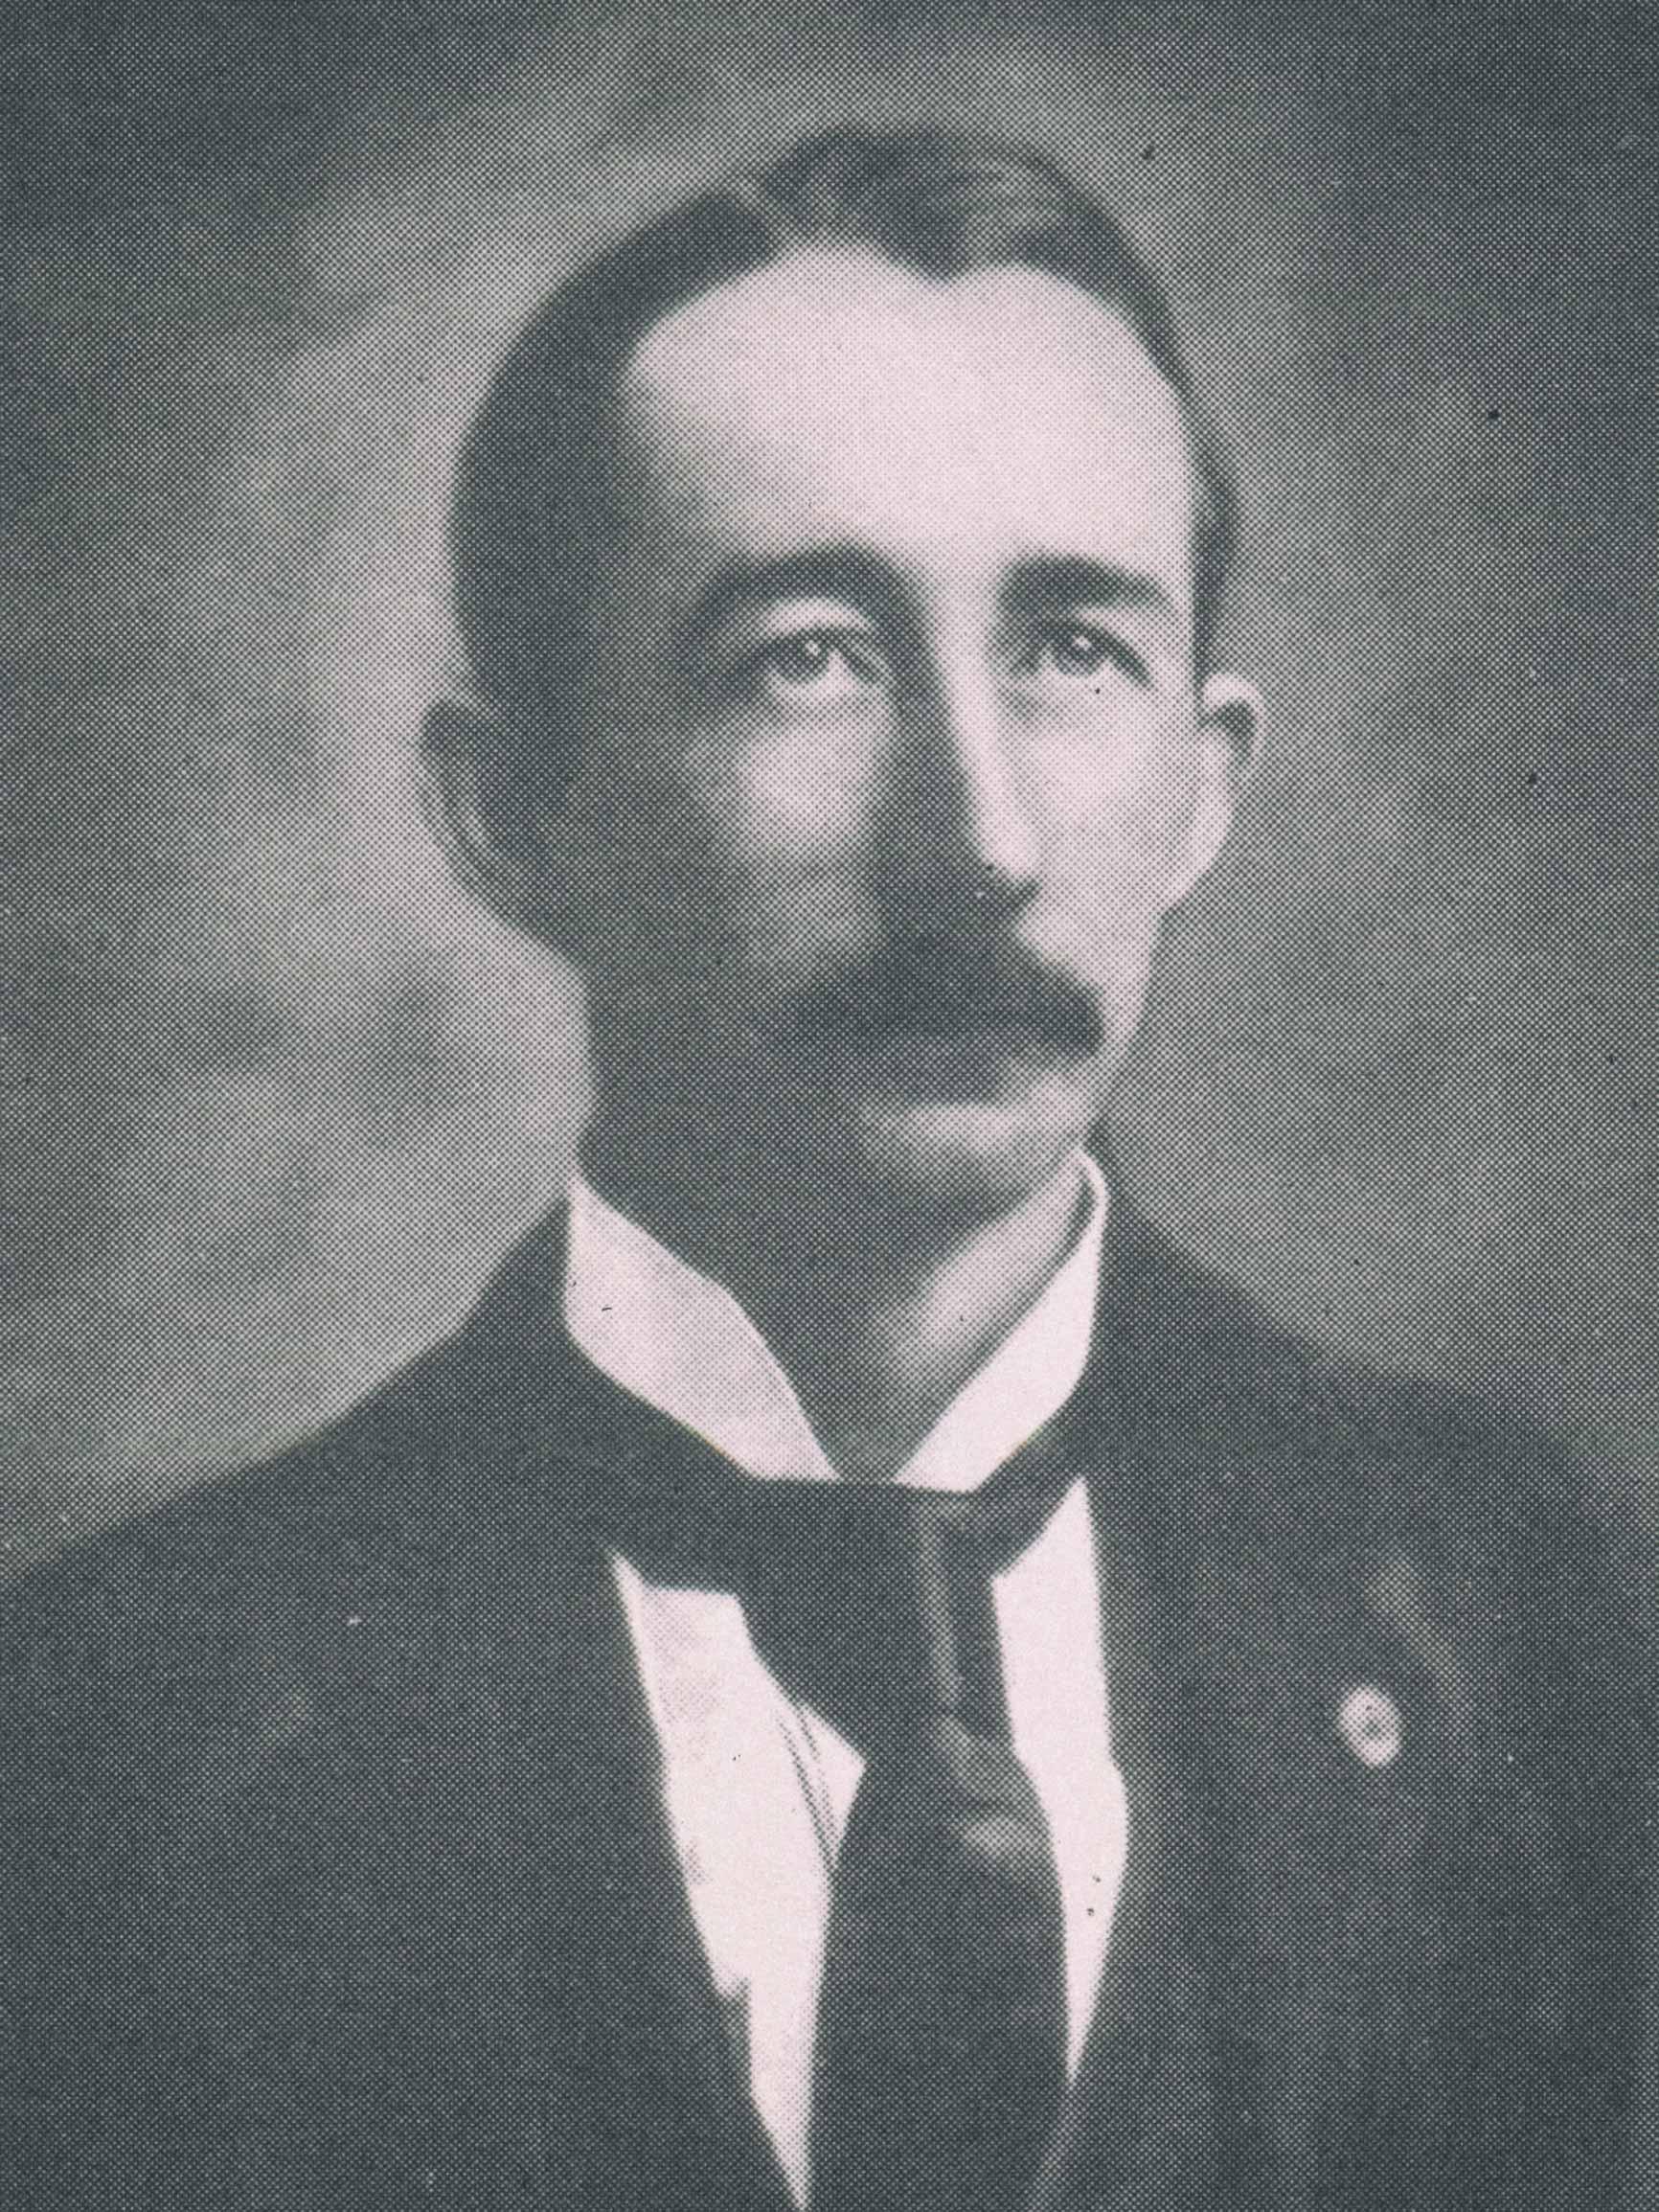 John T. White